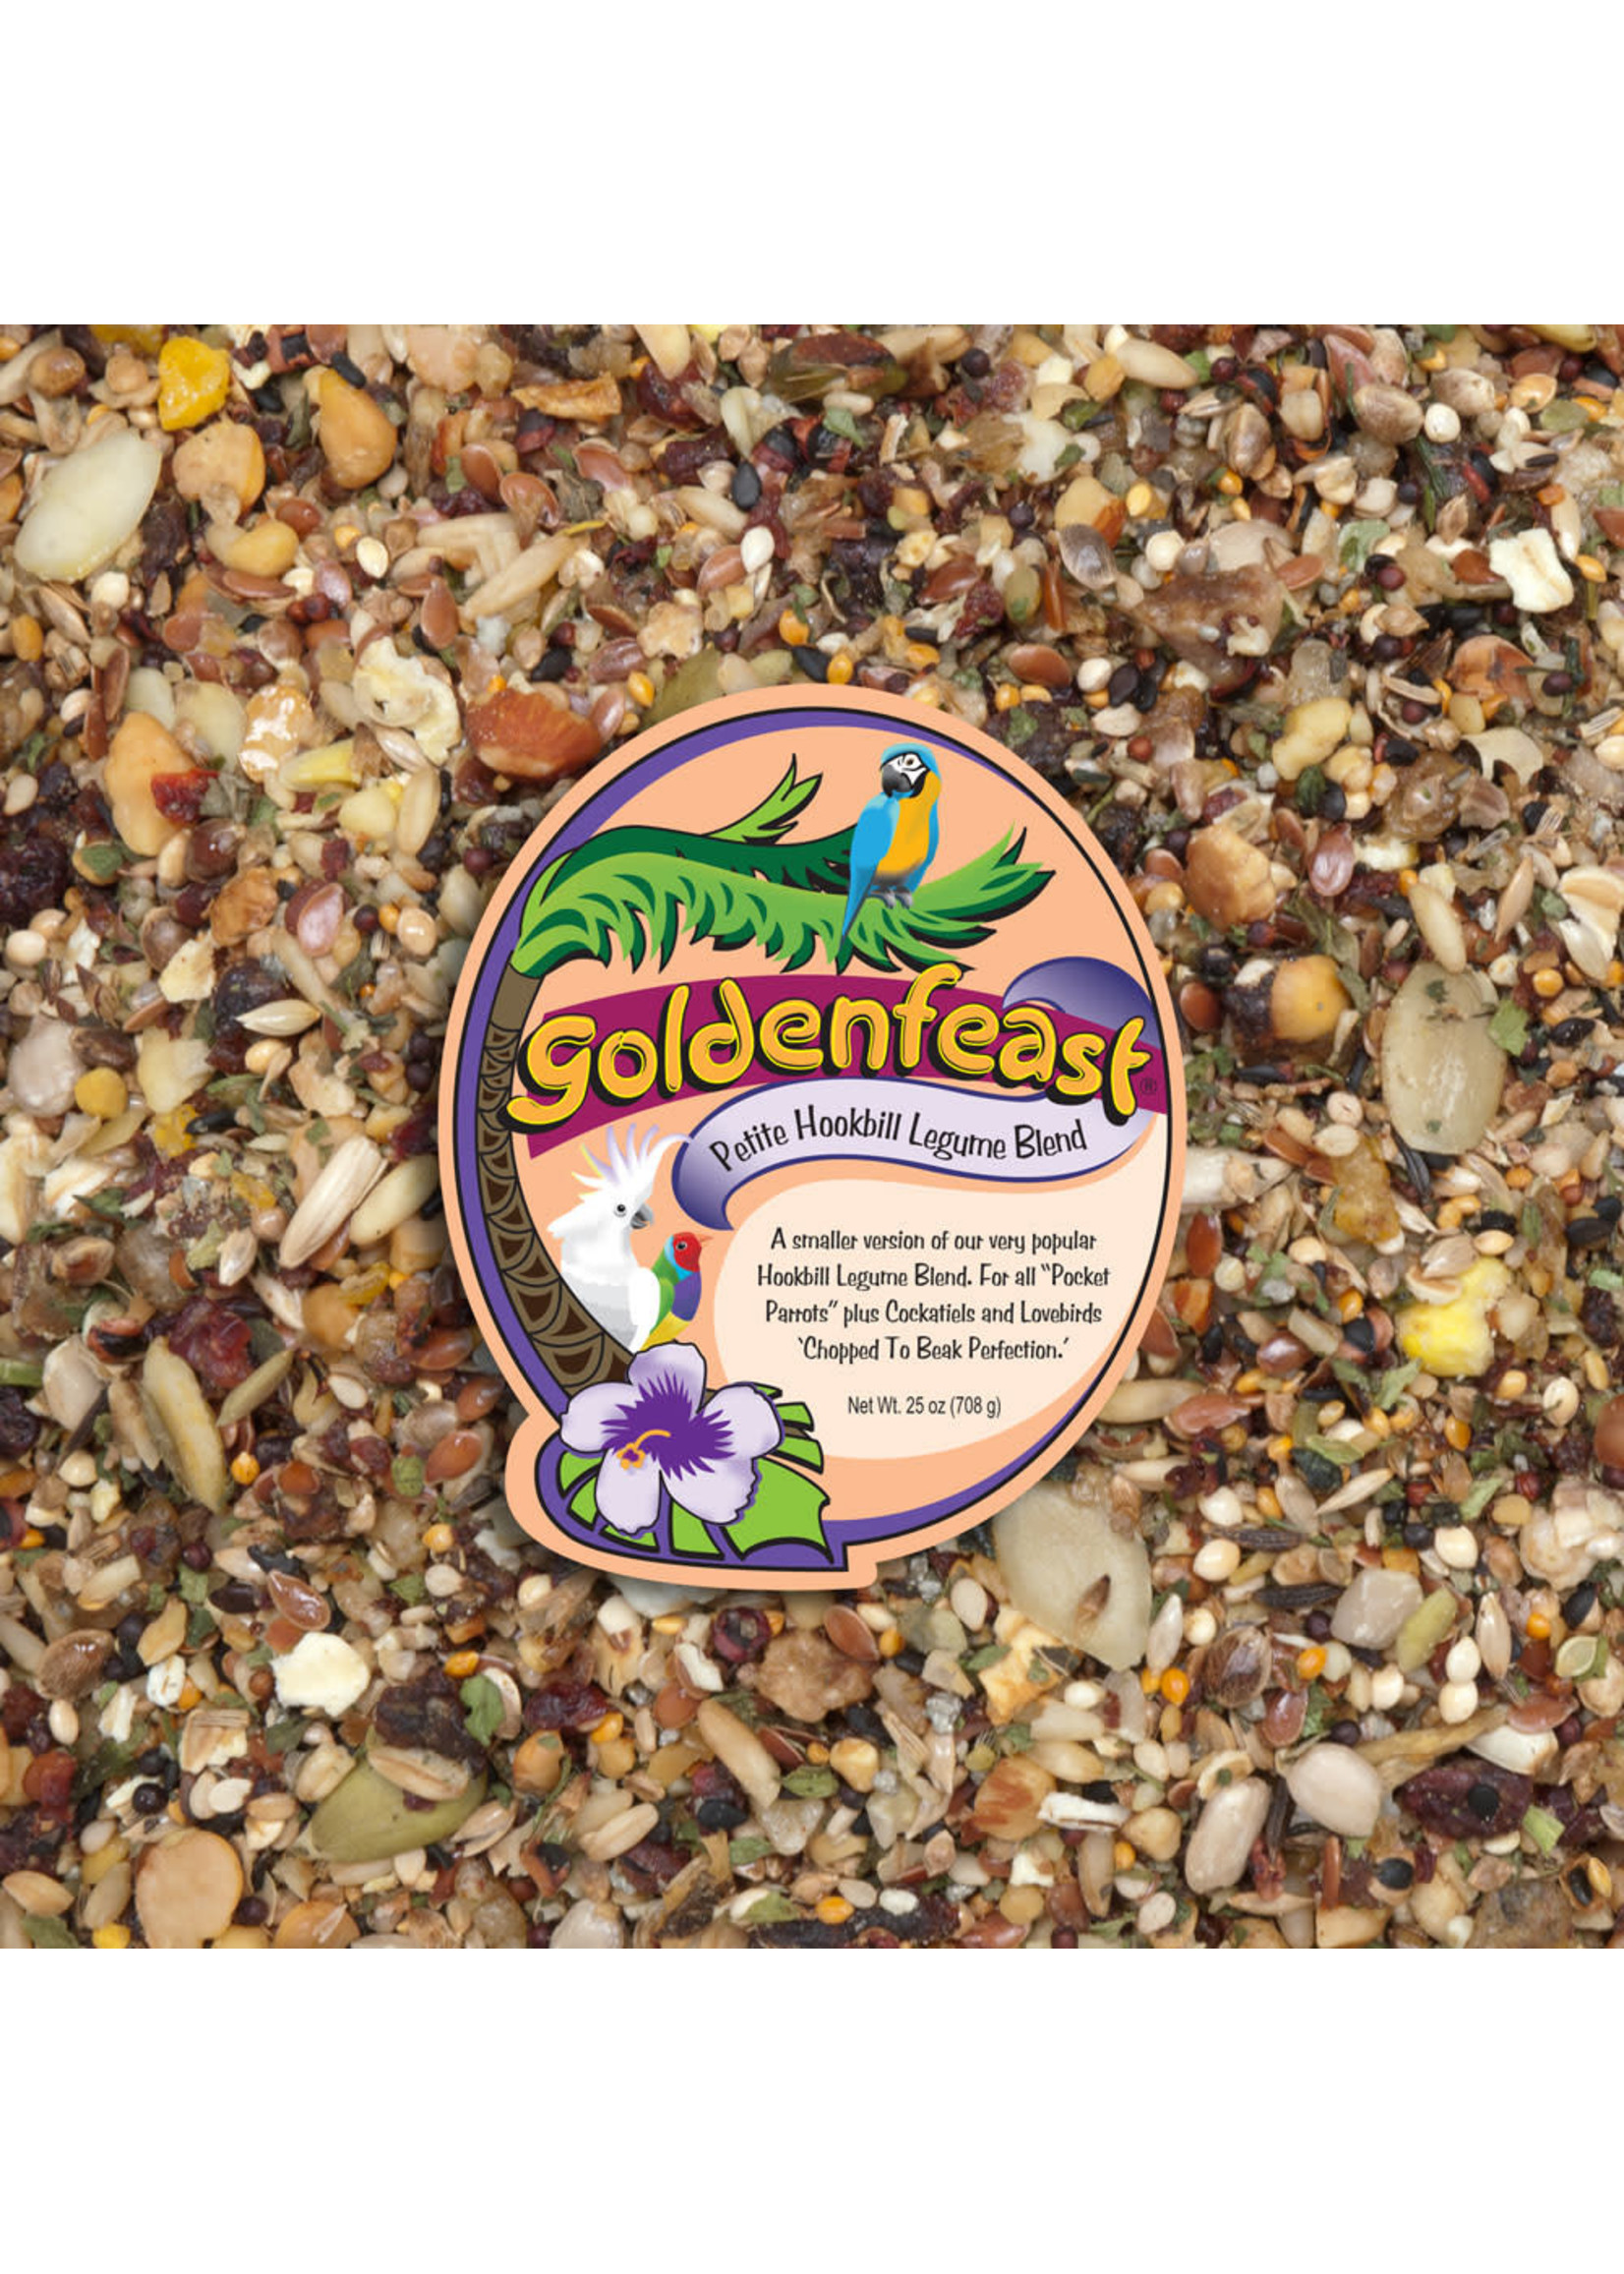 Goldenfeast GF Petite Hookbill Legume Blend (32LB)